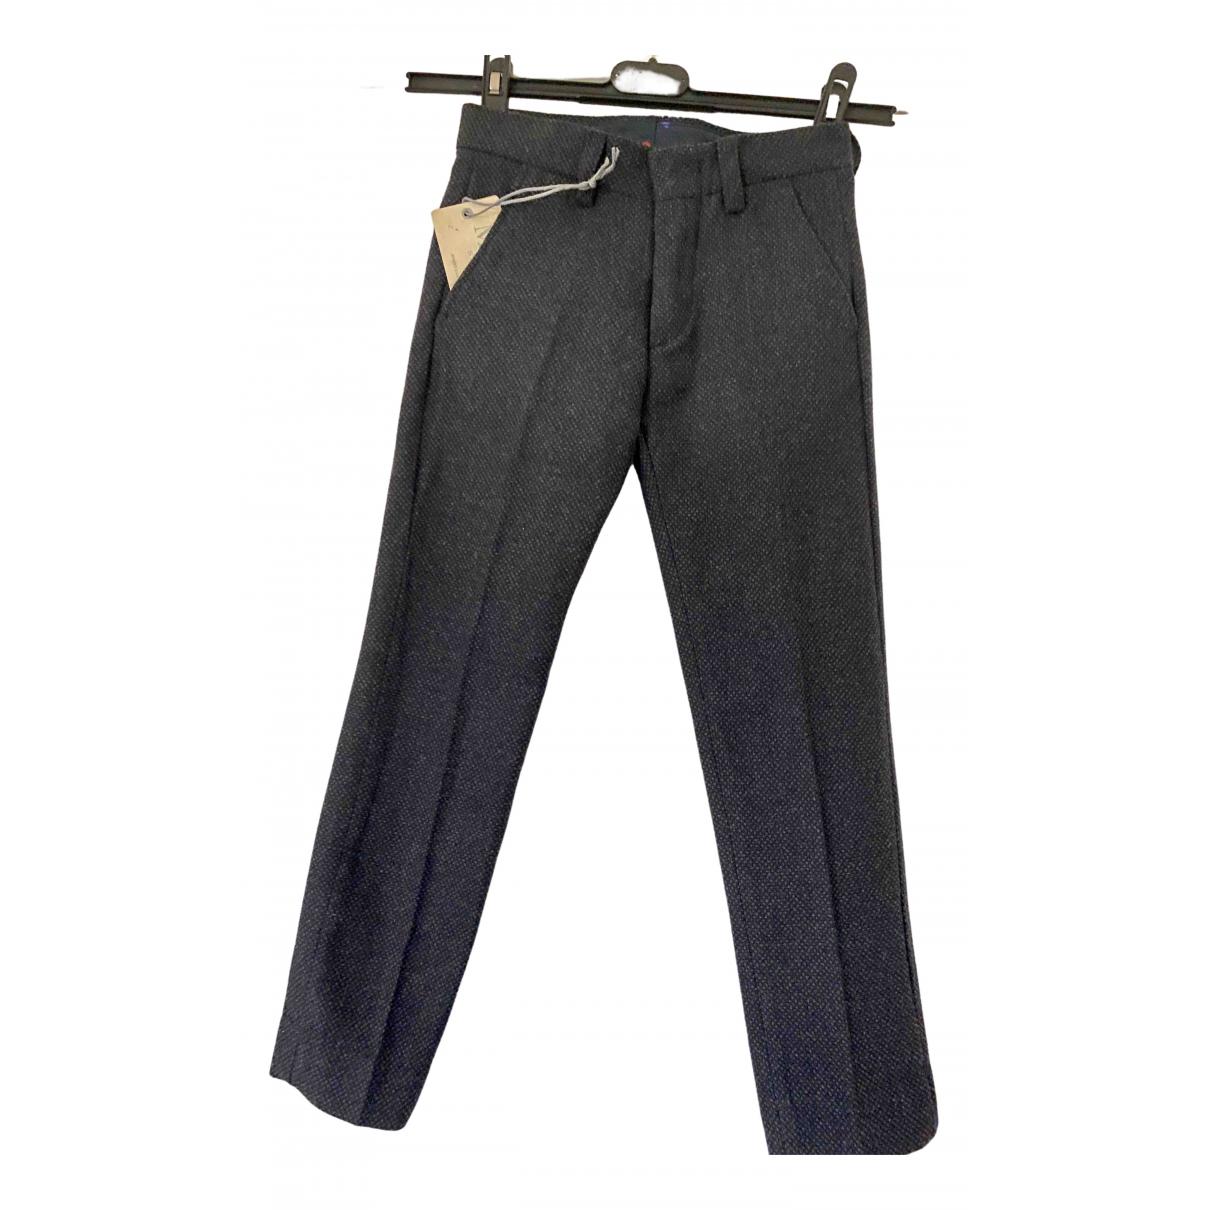 Pantalones en Algodon Azul Non Signe / Unsigned